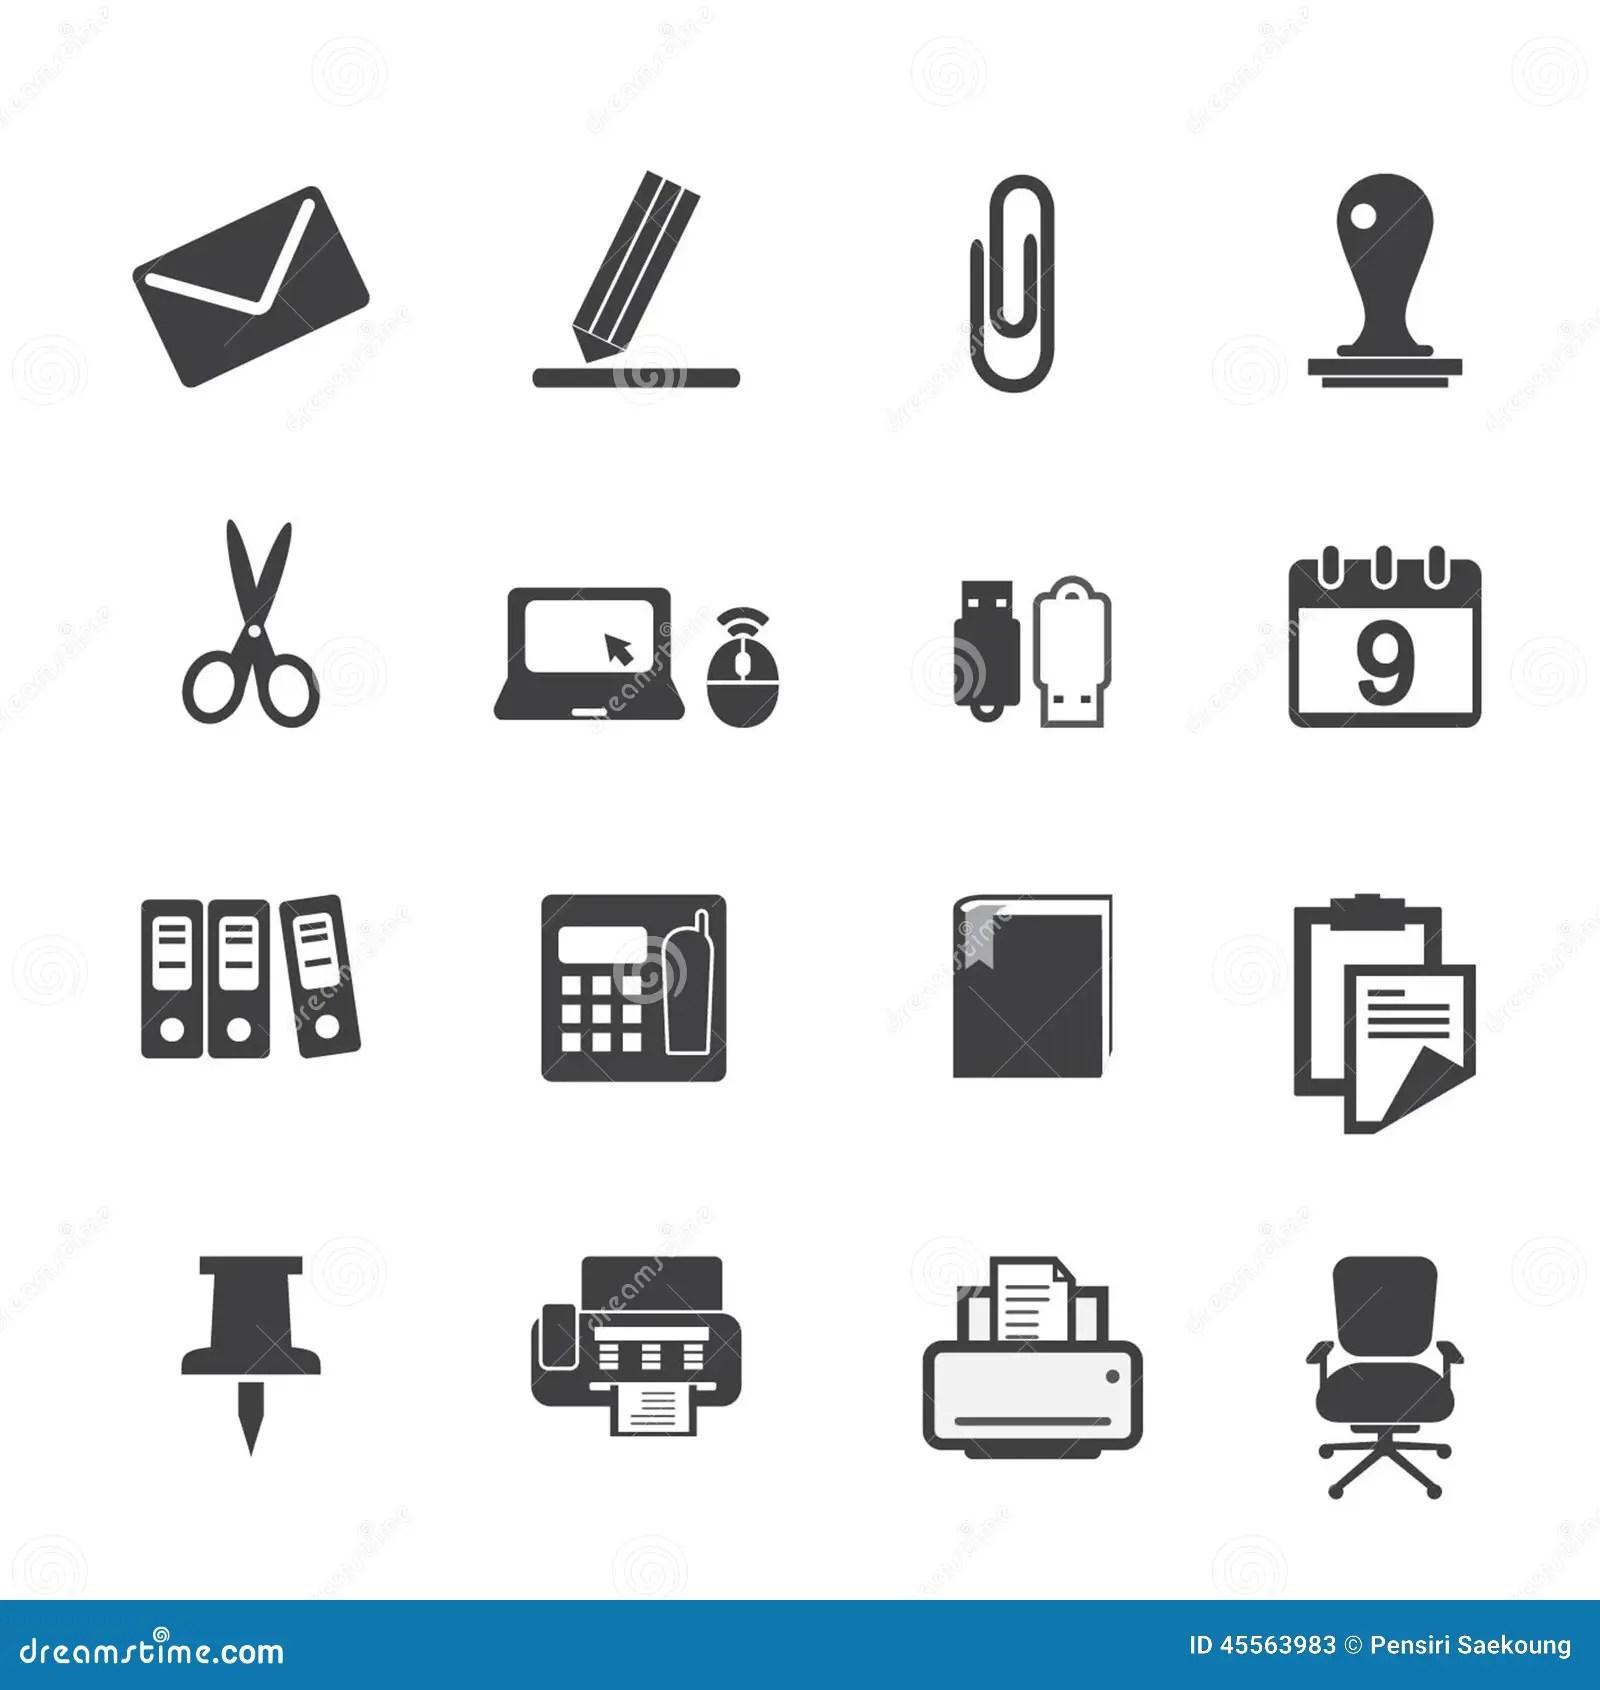 Icones De Fournitures De Bureau Reglees Illustration De